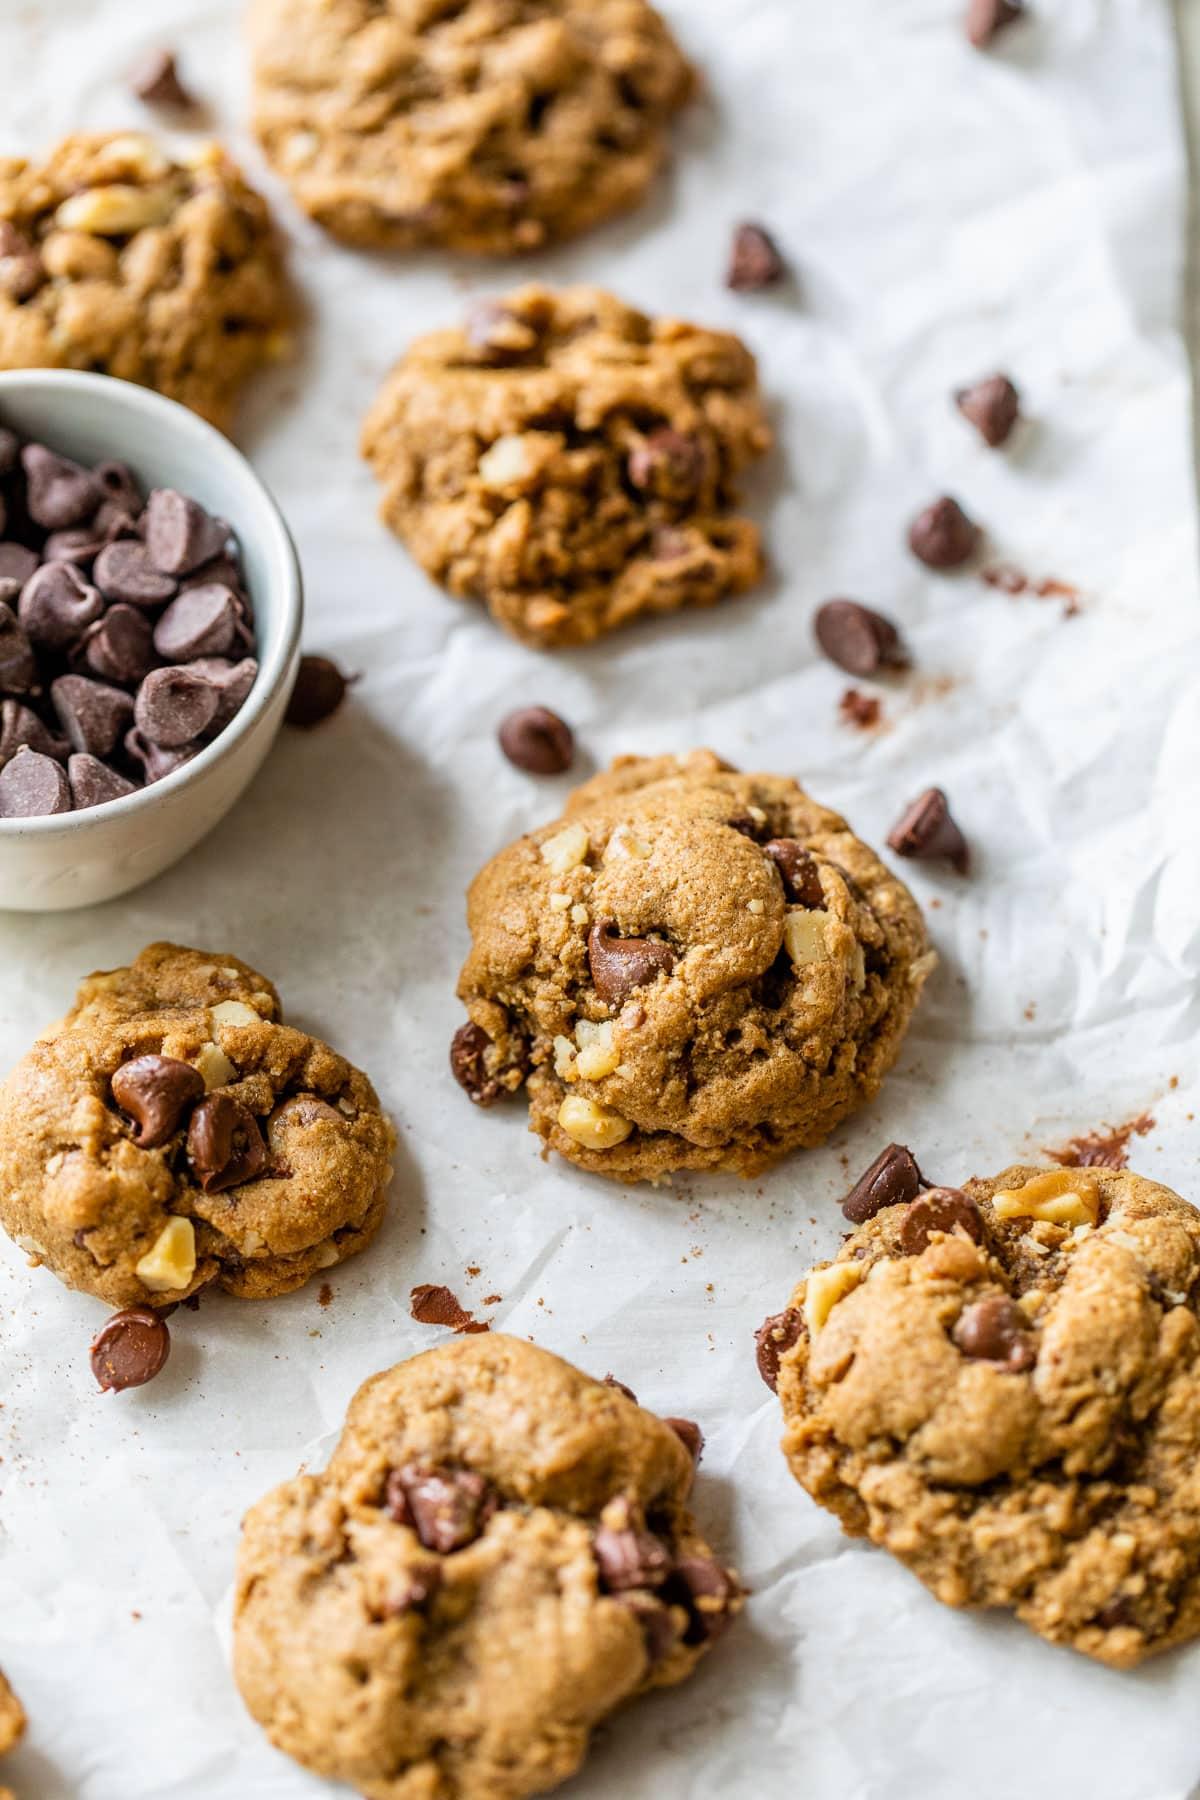 Old Fashioned Chocolate Chip Walnut Cookies with espresso, dark chocolate and cinnamon.